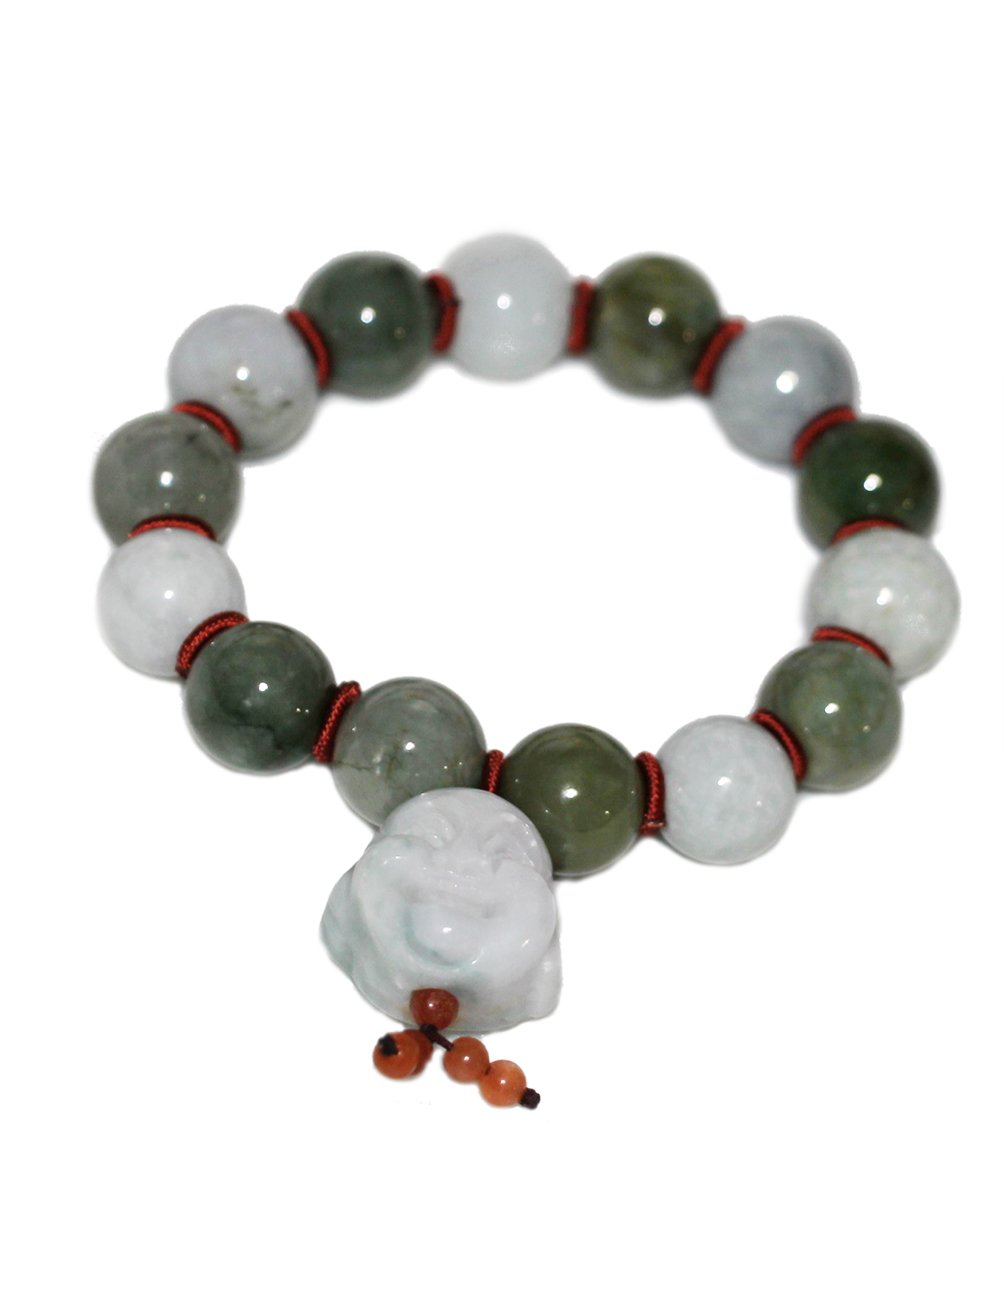 Dahlia Laughing Buddha Jade Bead Bracelet Genuine Certified Grade A Jadeite, 7''